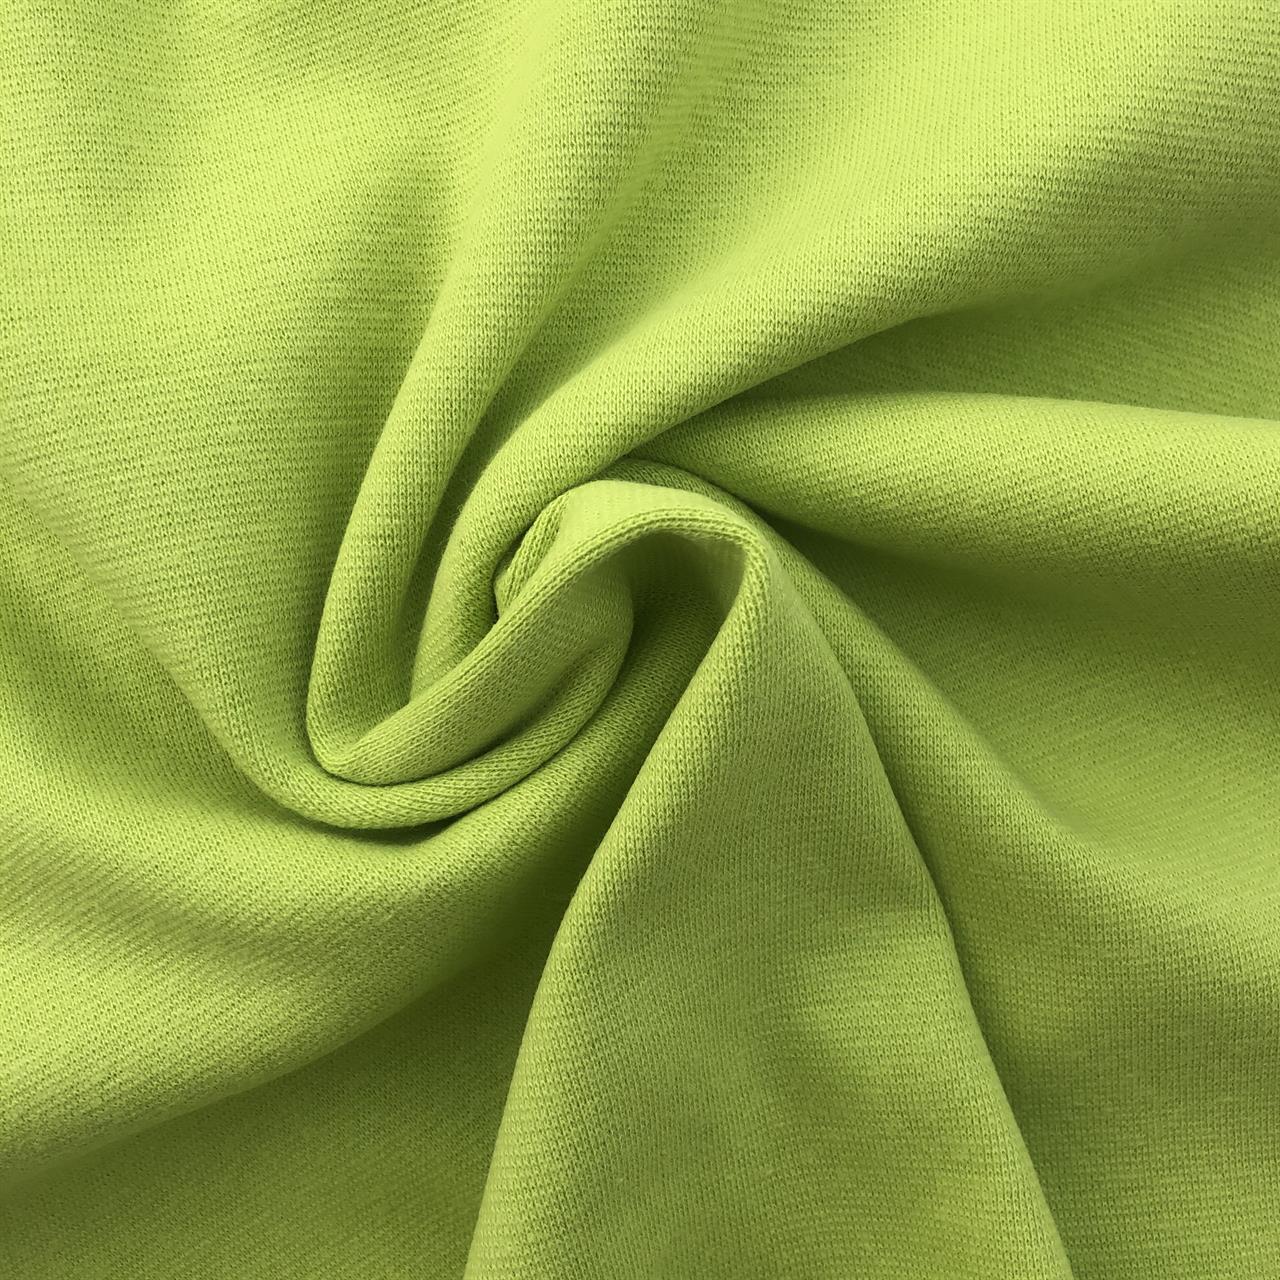 Ribb lys limegrønn